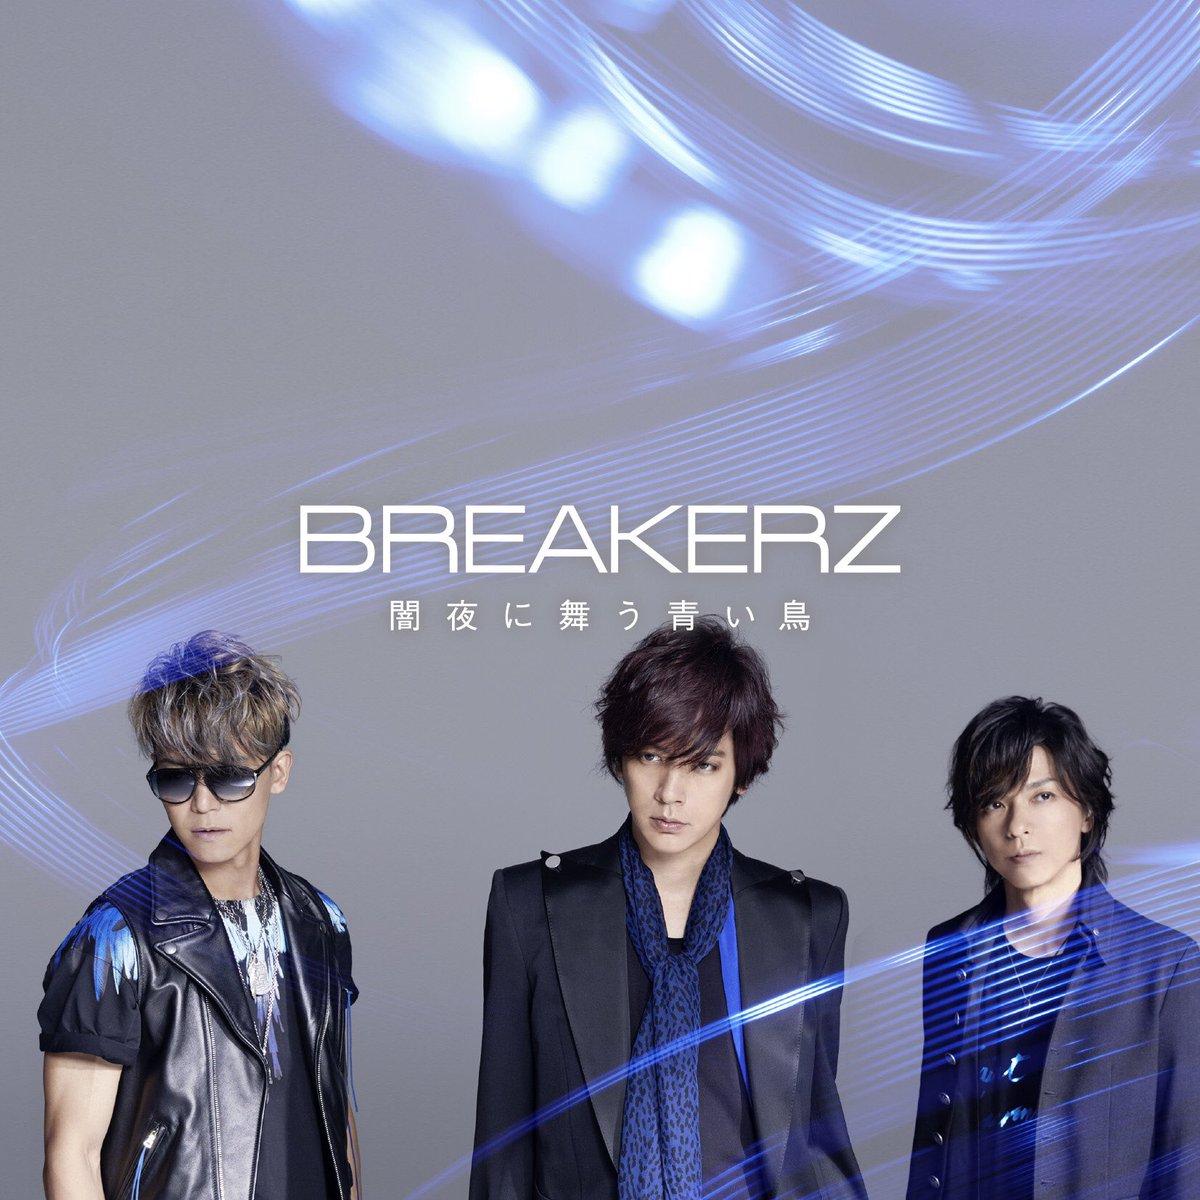 『BREAKERZ - 新しい世界へ 新しい時代へ -Single Version-』収録の『闇夜に舞う青い鳥』ジャケット